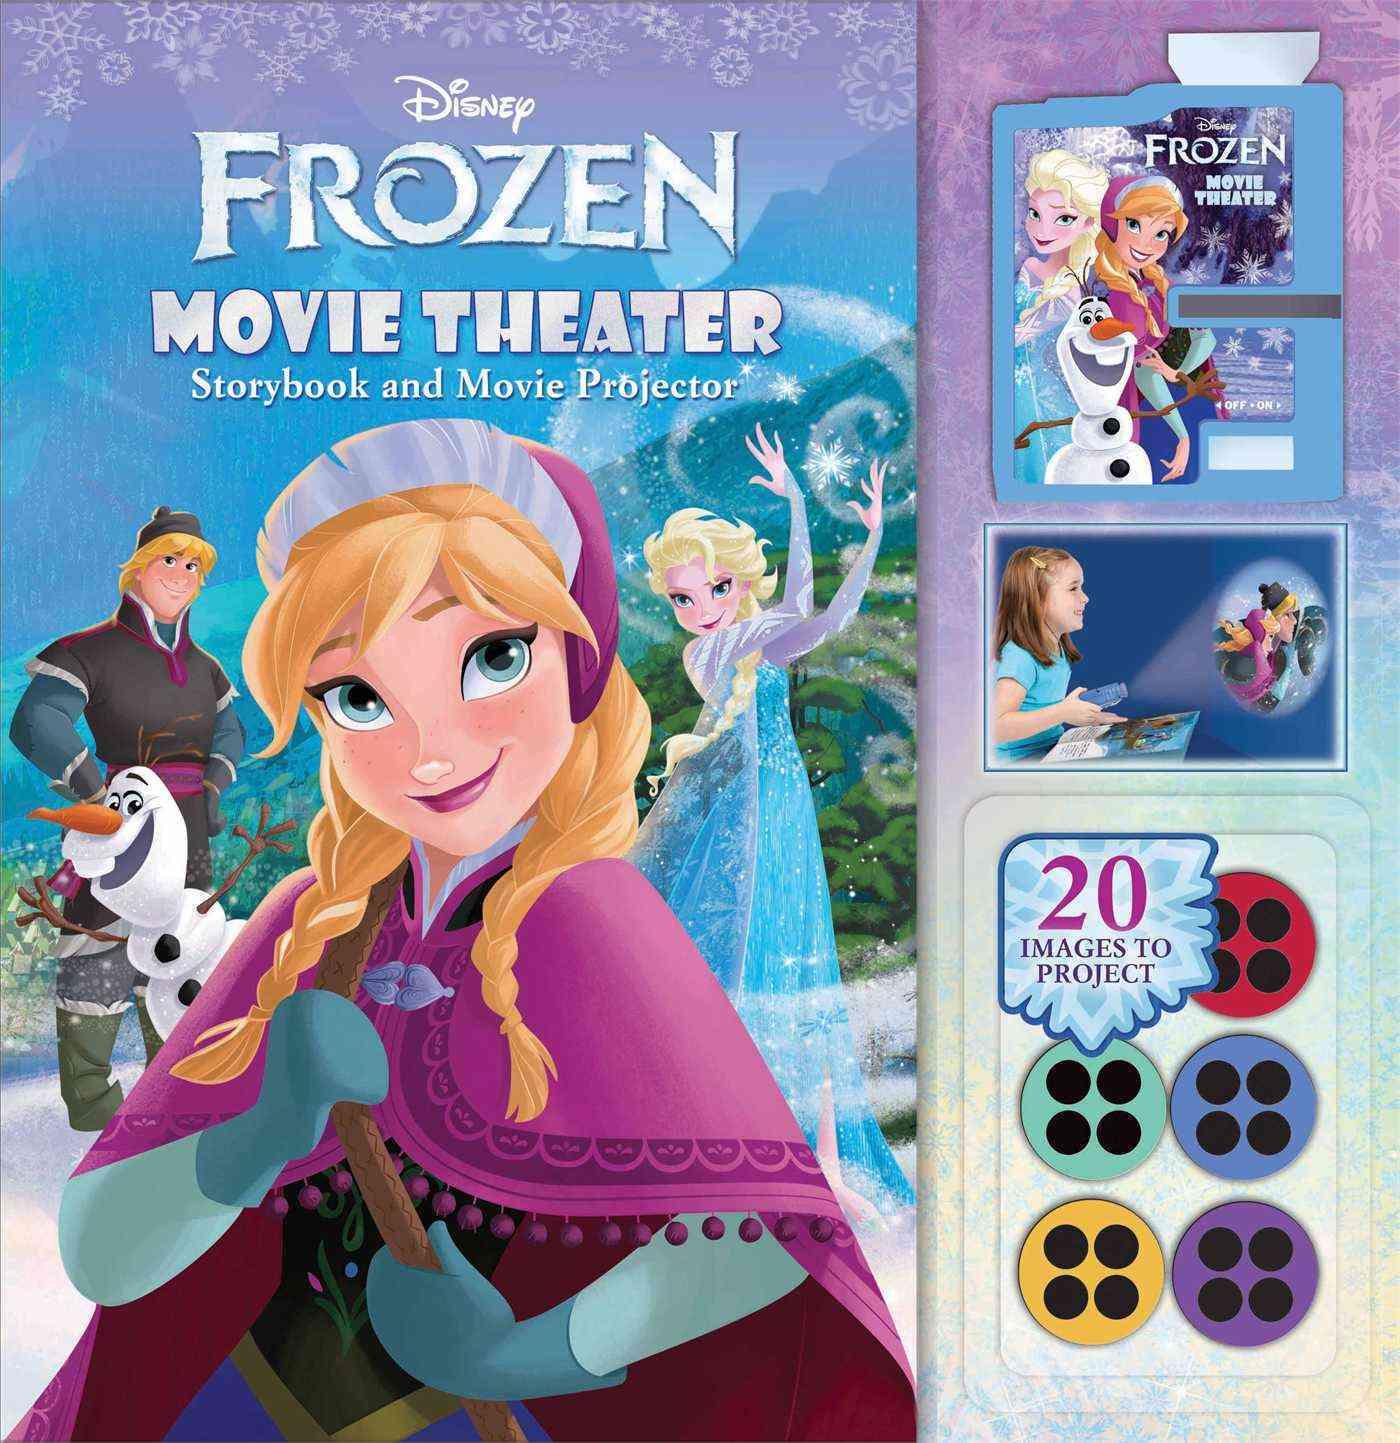 Disney Frozen Movie Theater By Disney Frozen (CRT)